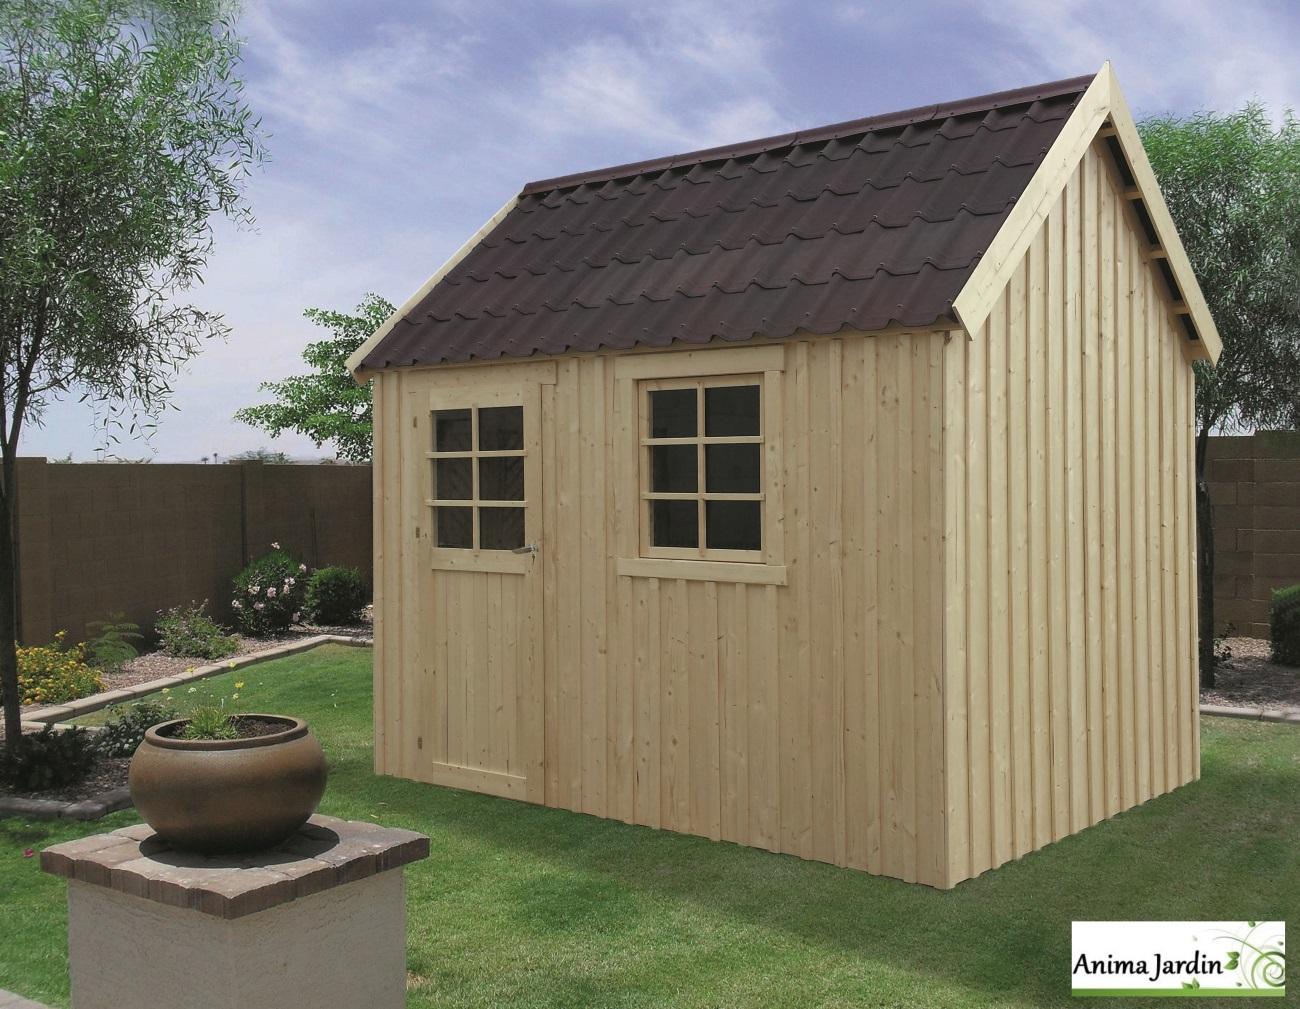 Abri en bois-Oléron-chalet-cabane-6,12m²-rangement jardin-Anima-Jardin.fr